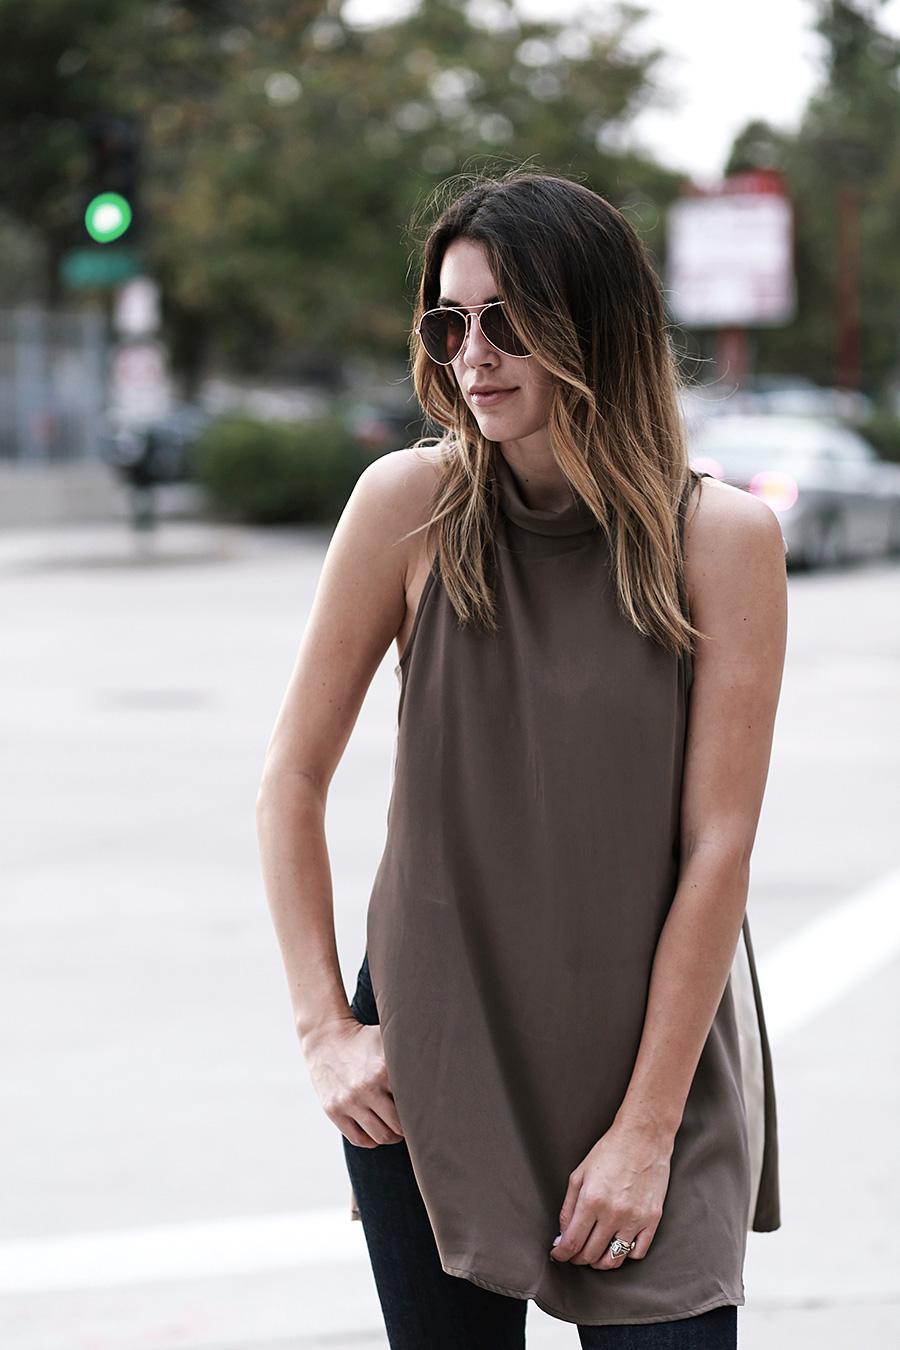 forever21 side slit tunic forever21 denim white heels thrifts and threads  2